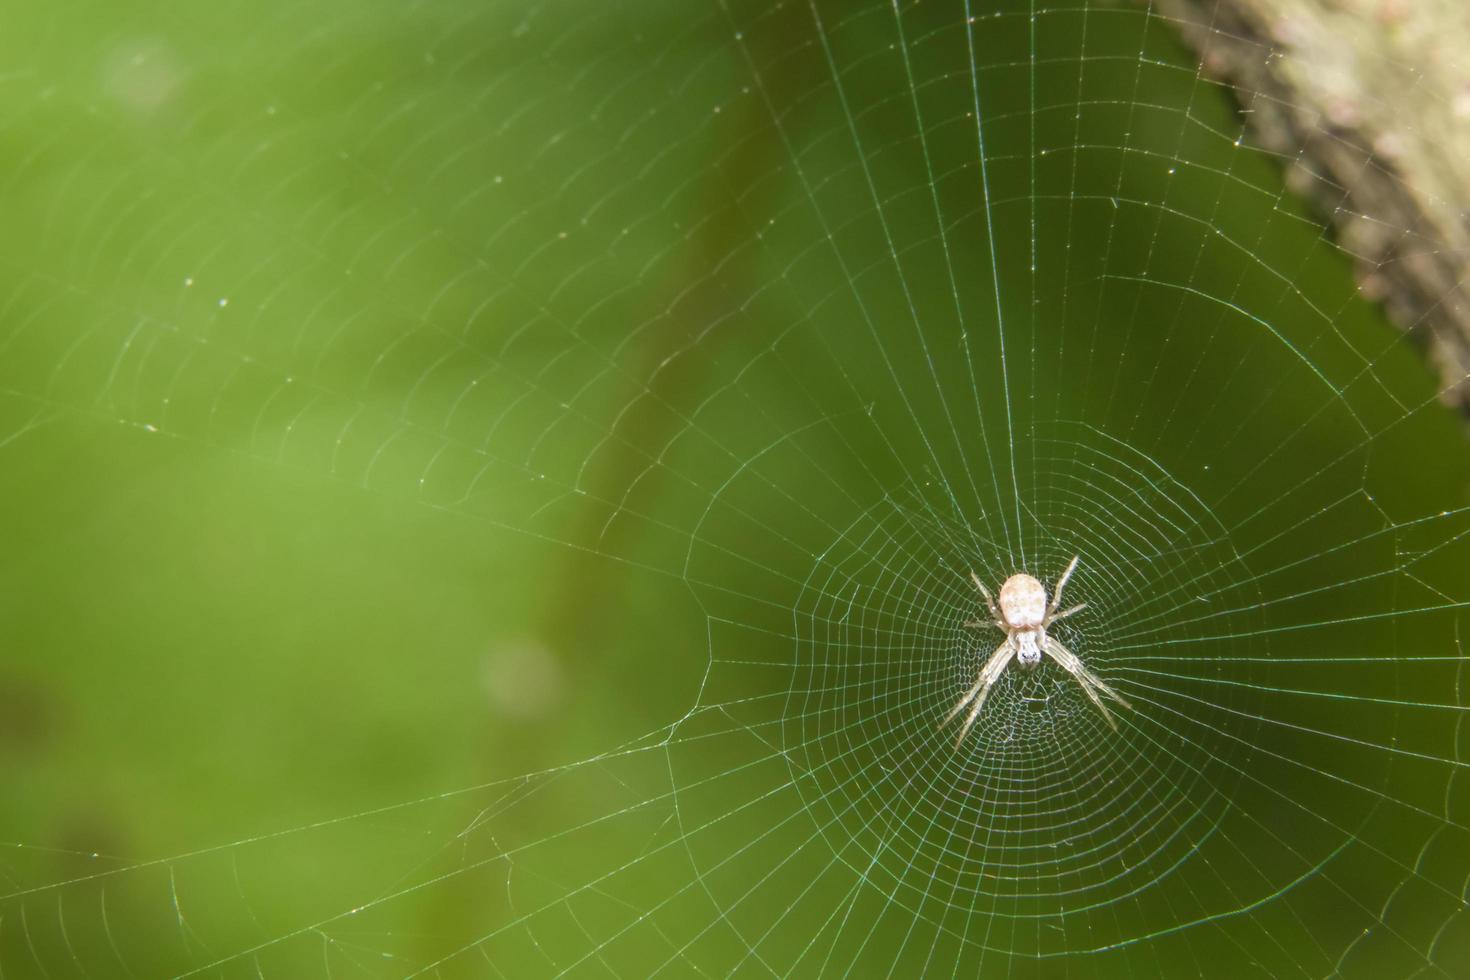 Spider in the spider web photo